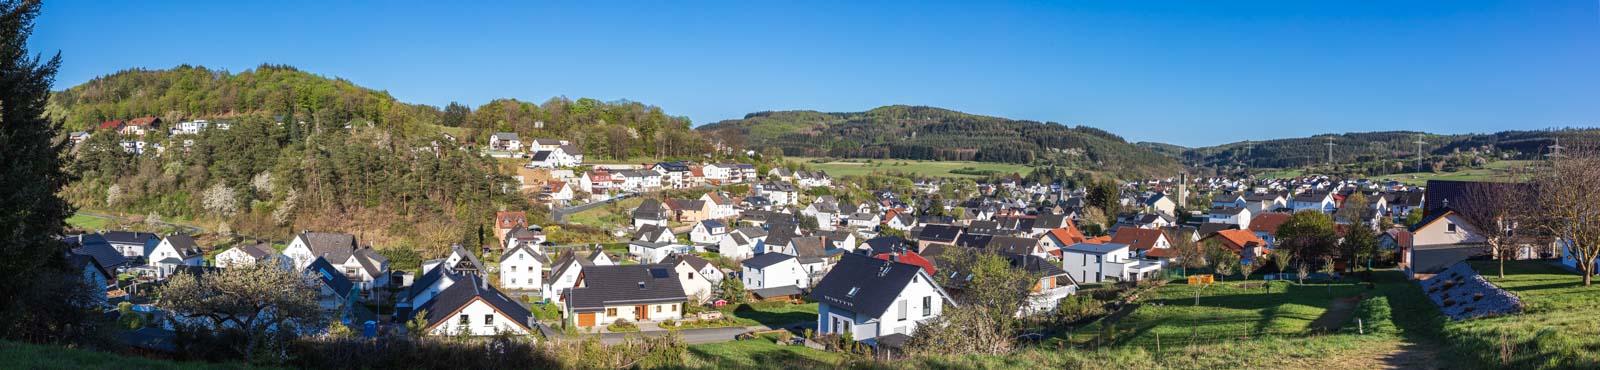 Deutschland, Europa, Europe, Frühling, Germany, Hessen, Hessia, Hinterland, Lahn-Dill-Bergland, Location, Ort, Spring